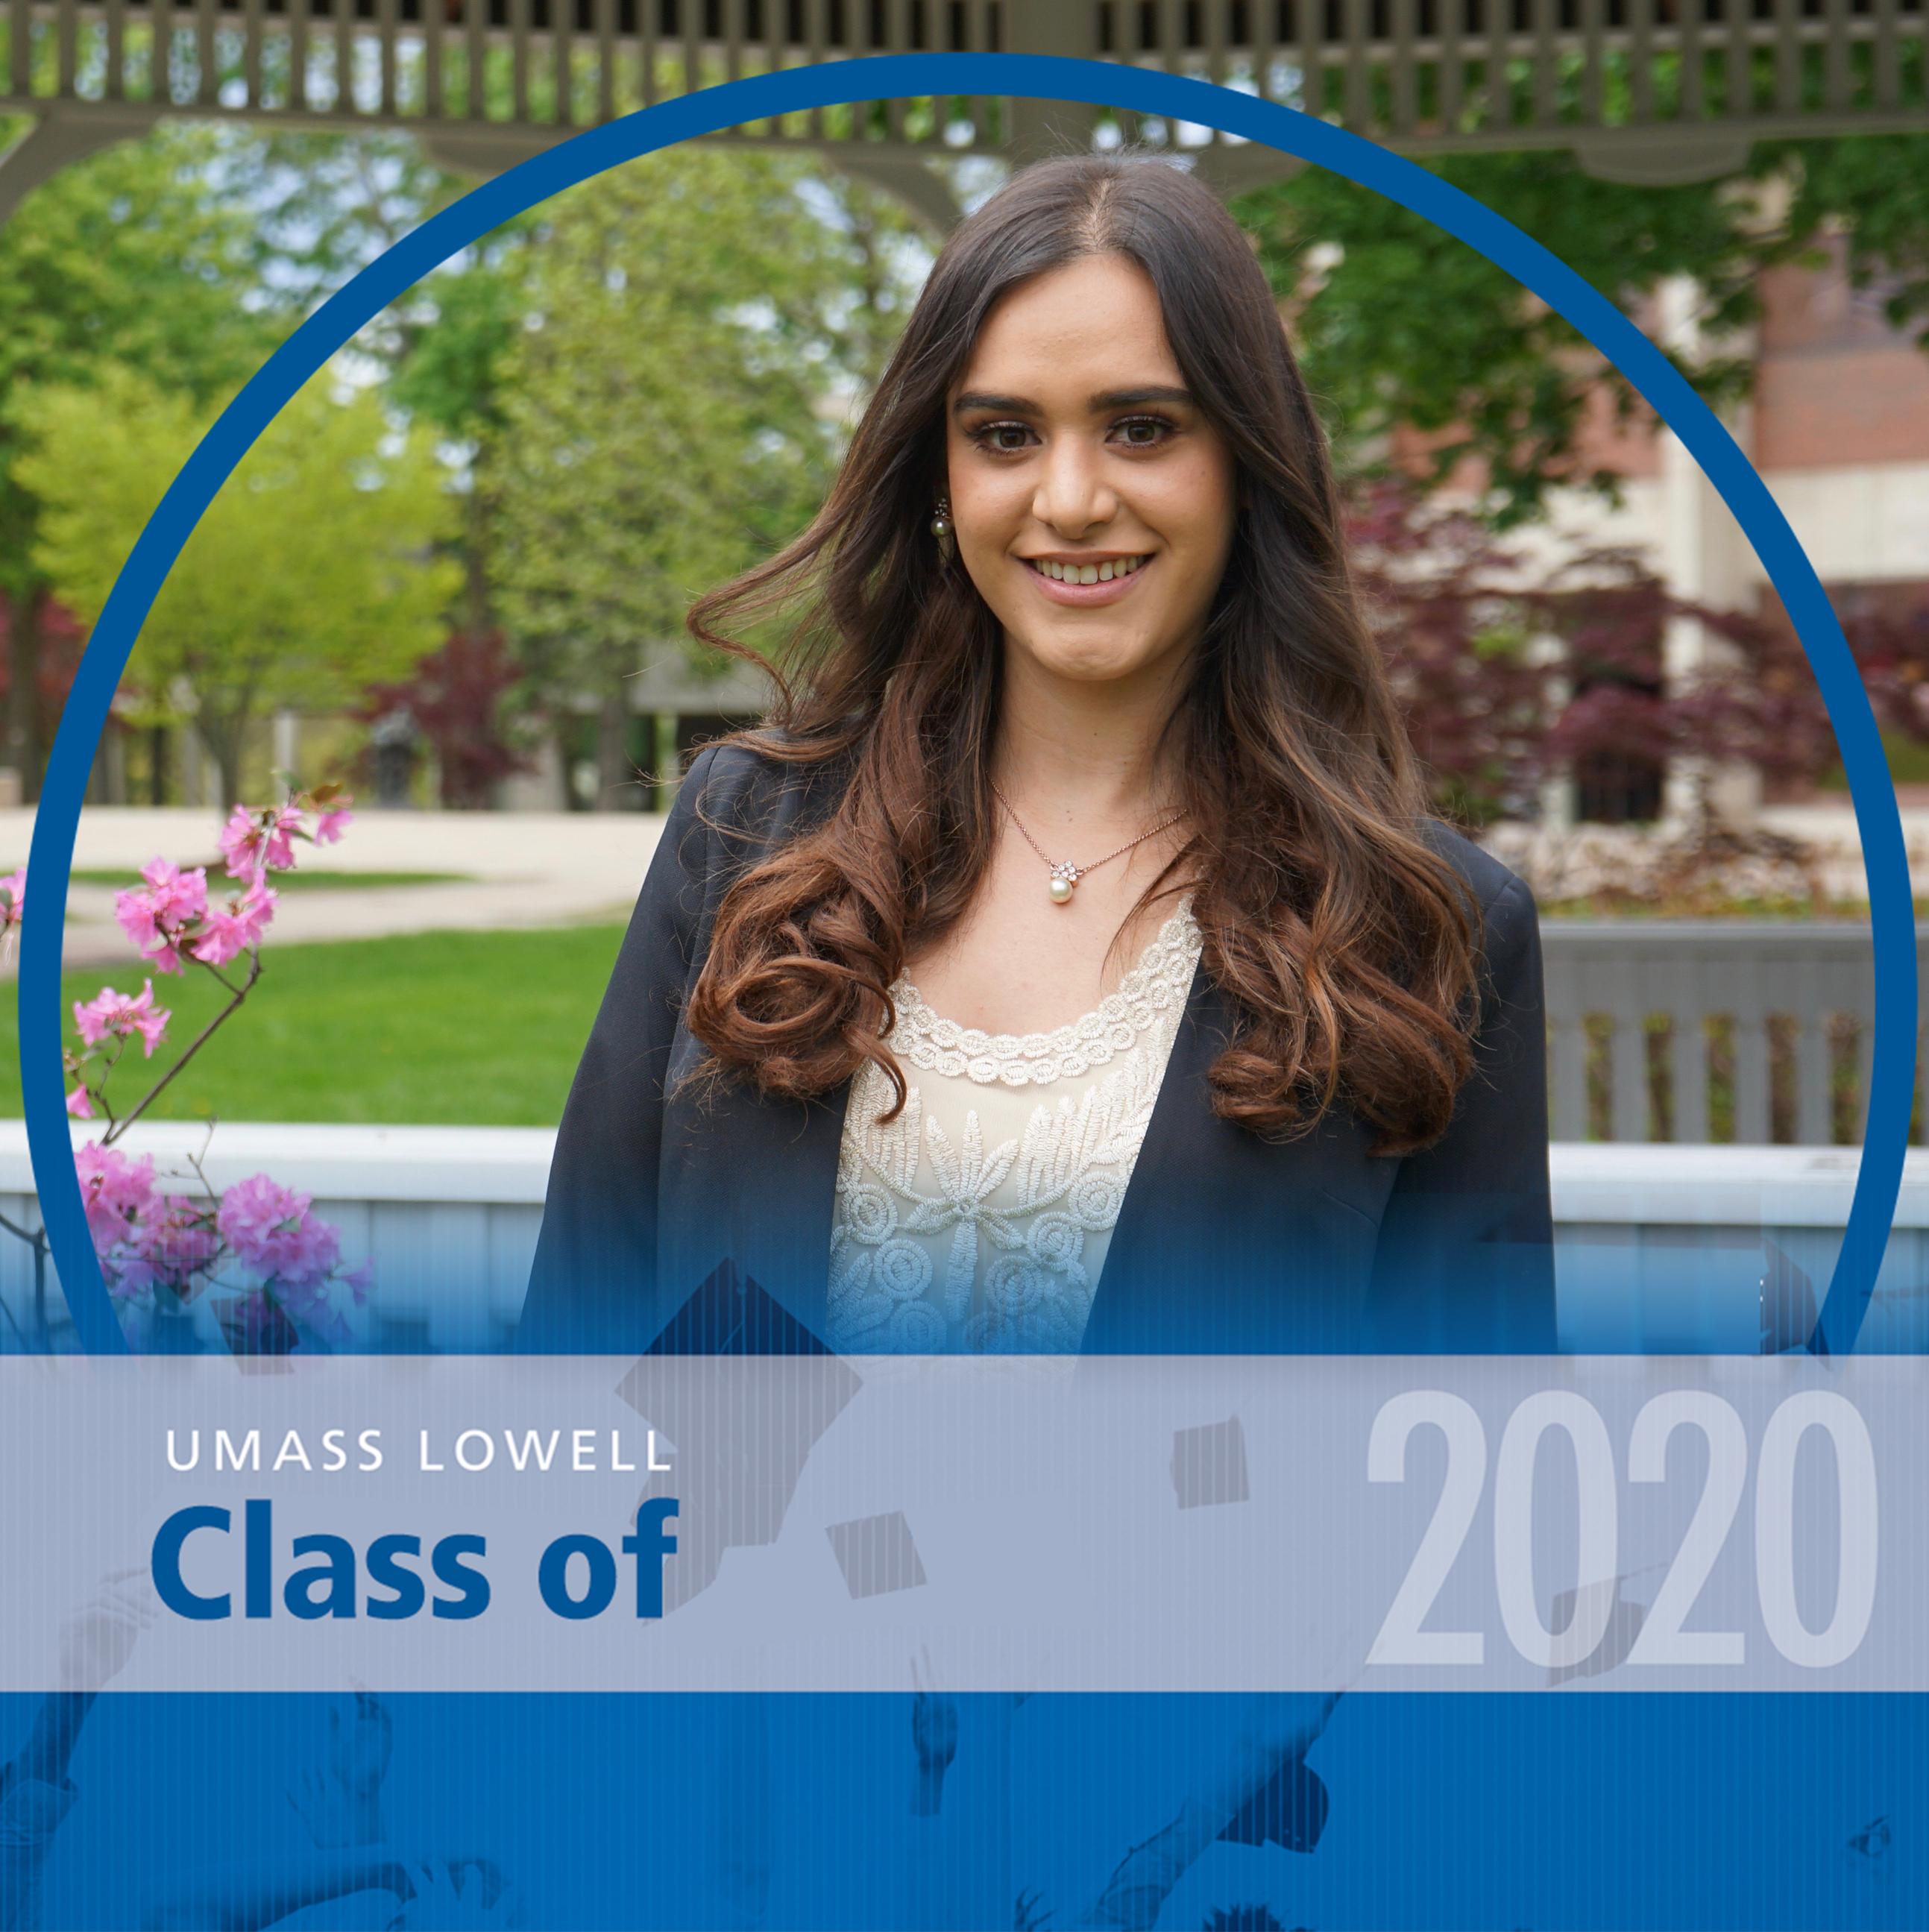 Umass Lowell Christmas Break 2020 Caps off to the Class of 2020 | UMass Lowell